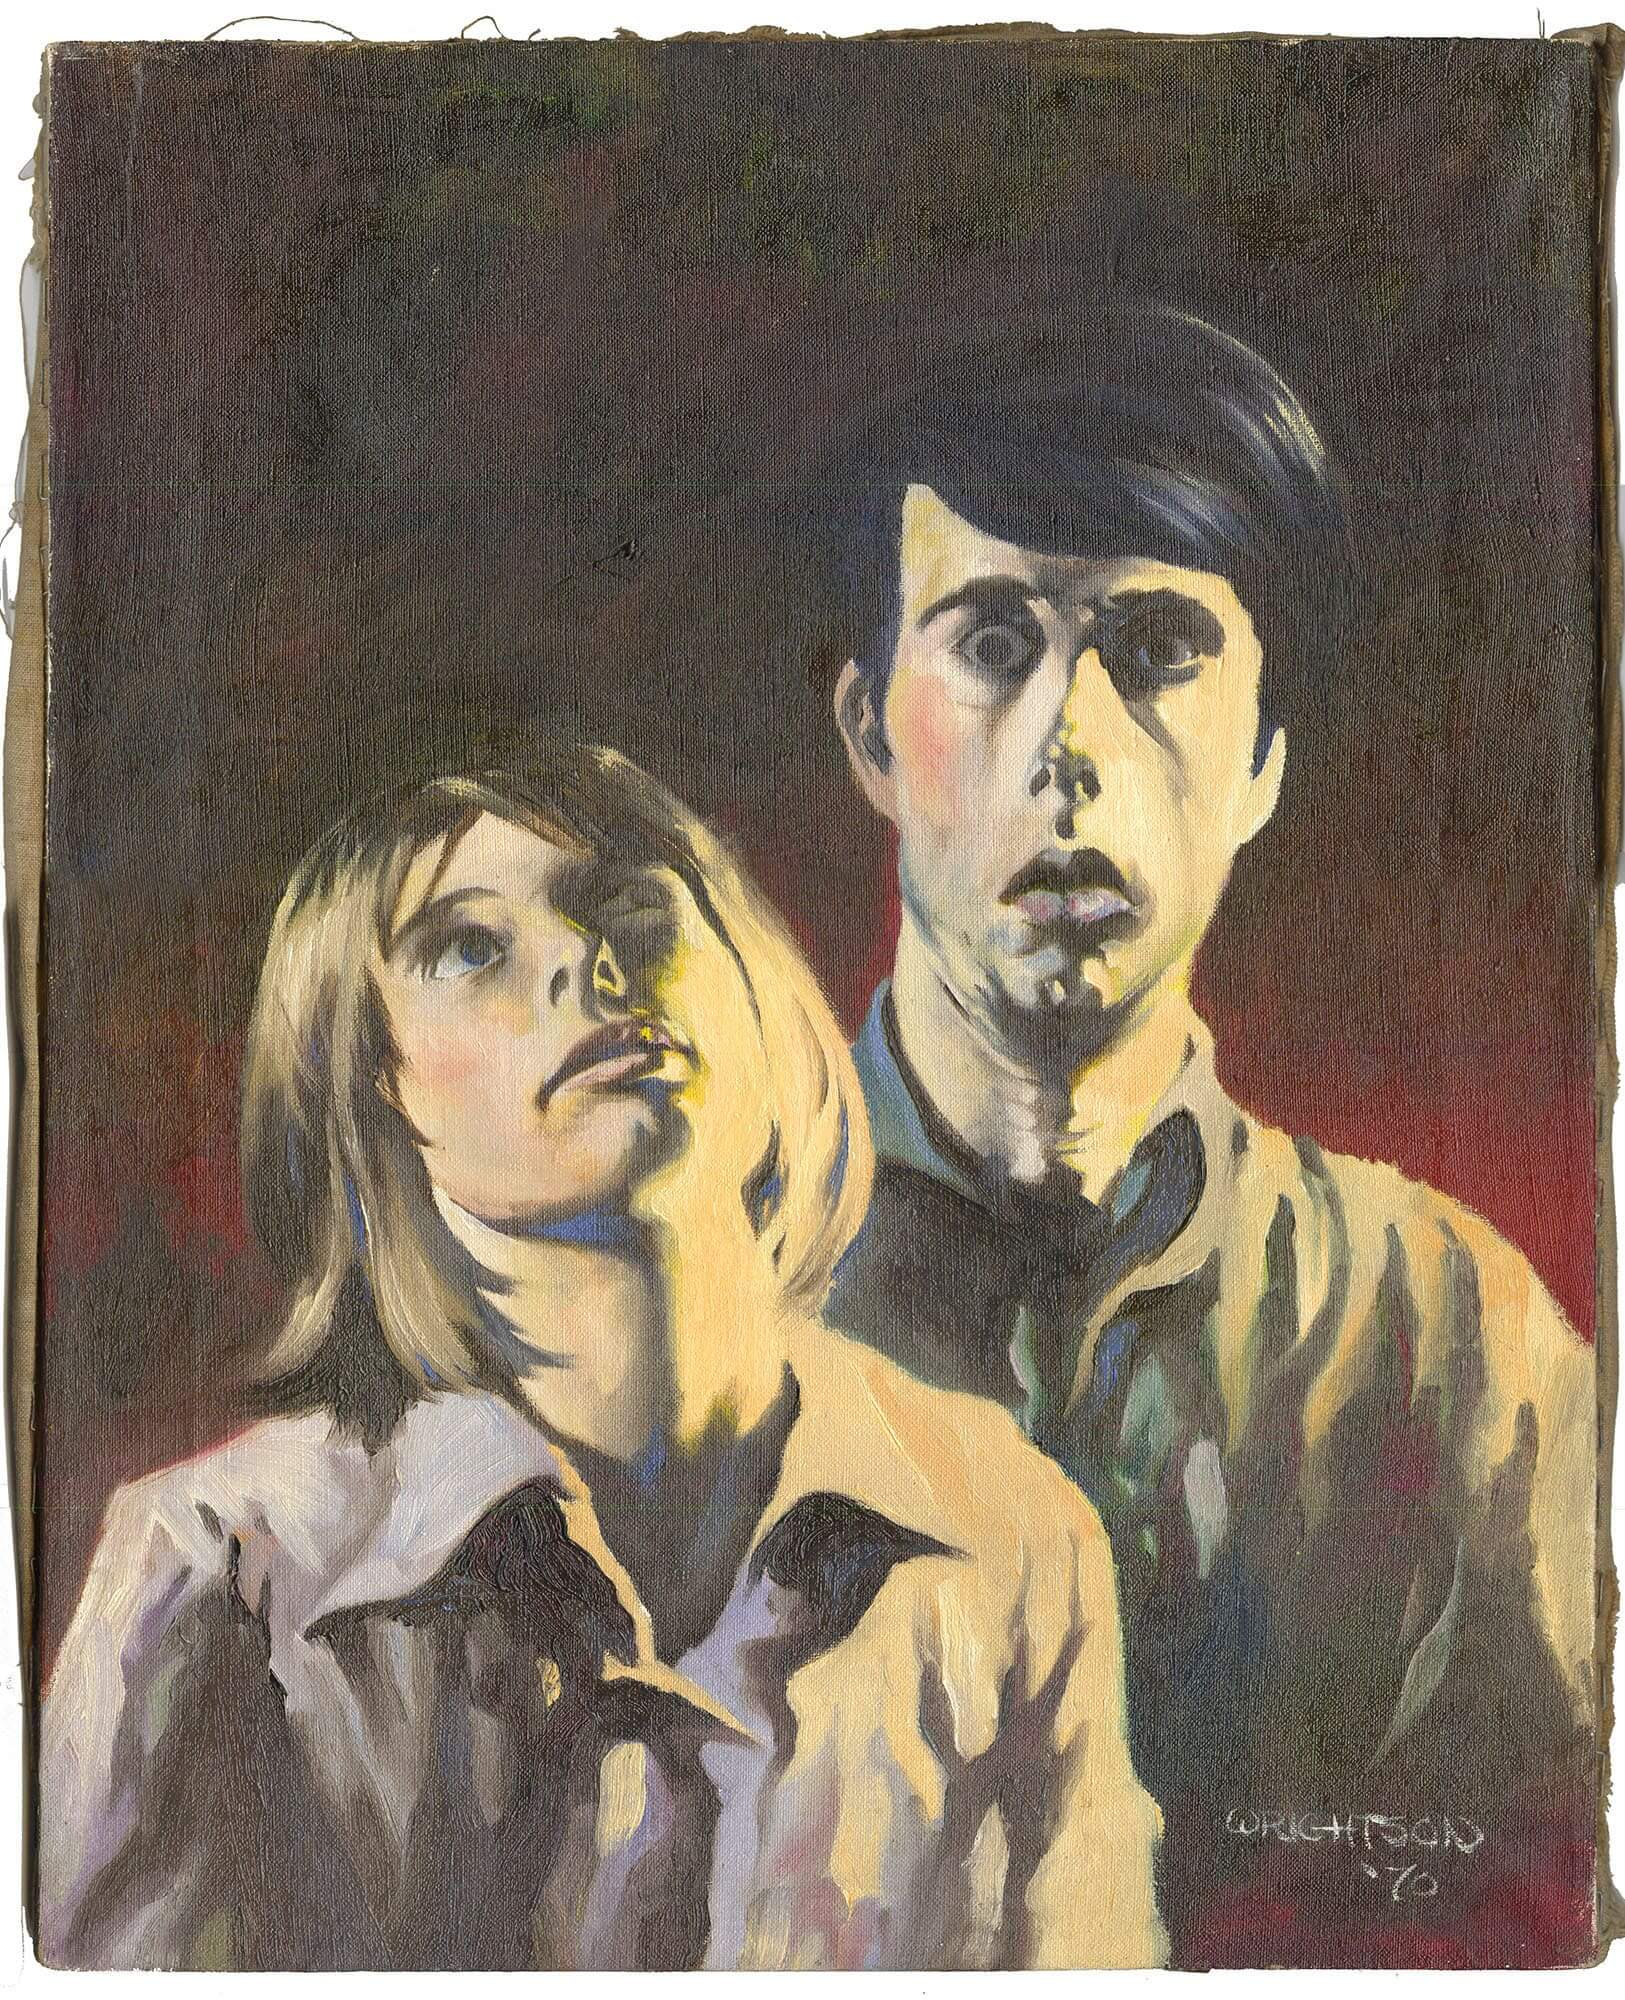 Wrightson Portrait of Jeffrey and Louise Jones  (Later Louise Simonson)